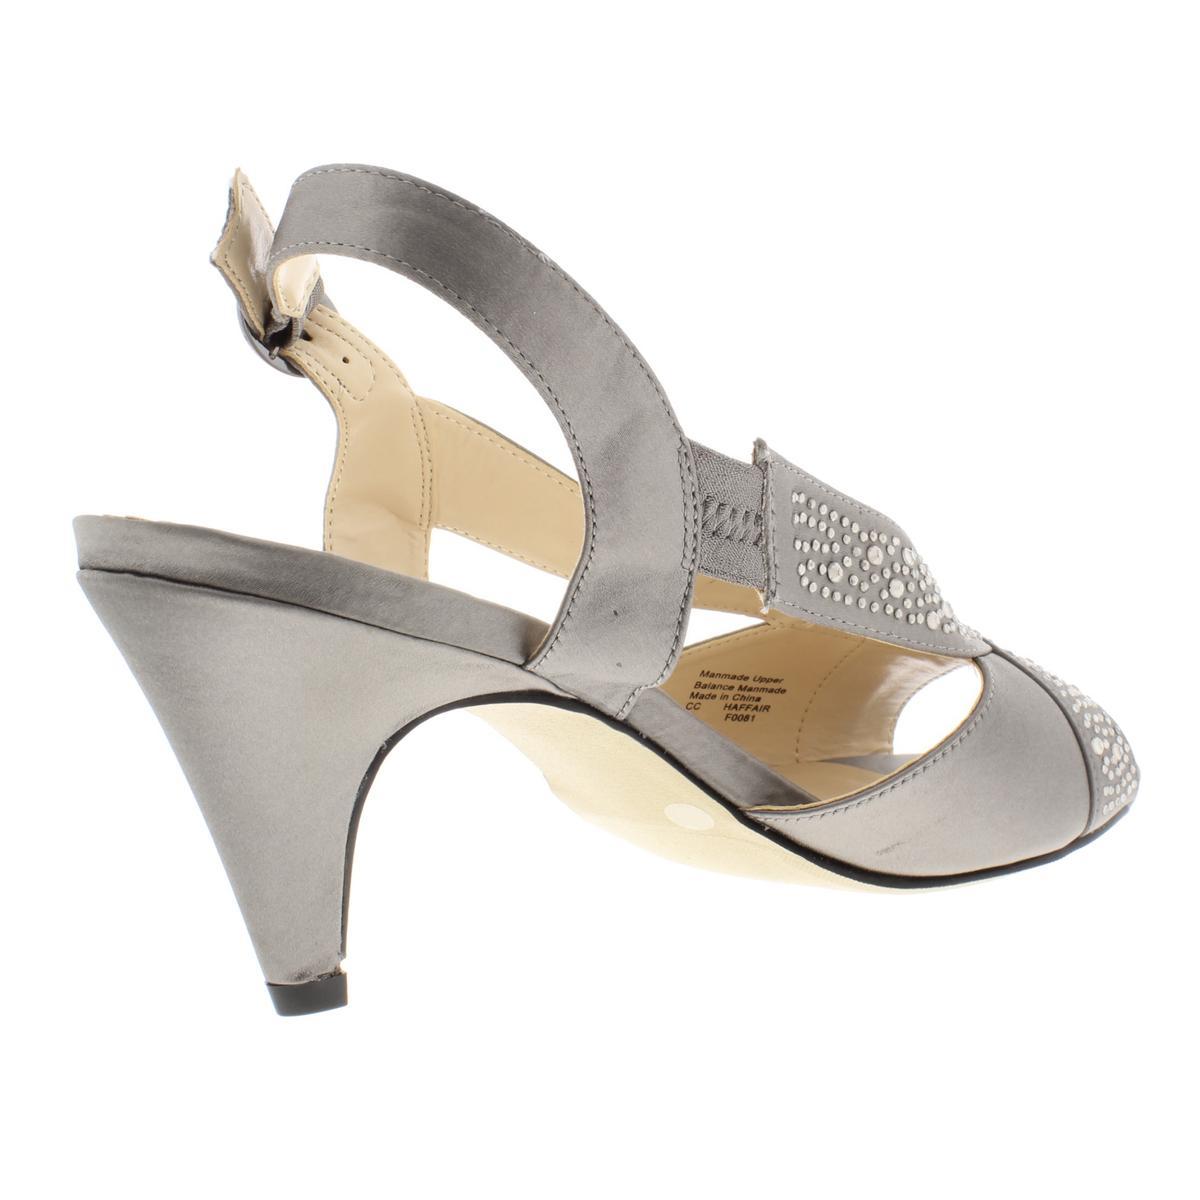 Charter-Club-Womens-Haffair-Satin-Heels-Dress-Sandals-Evening-BHFO-6807 thumbnail 6